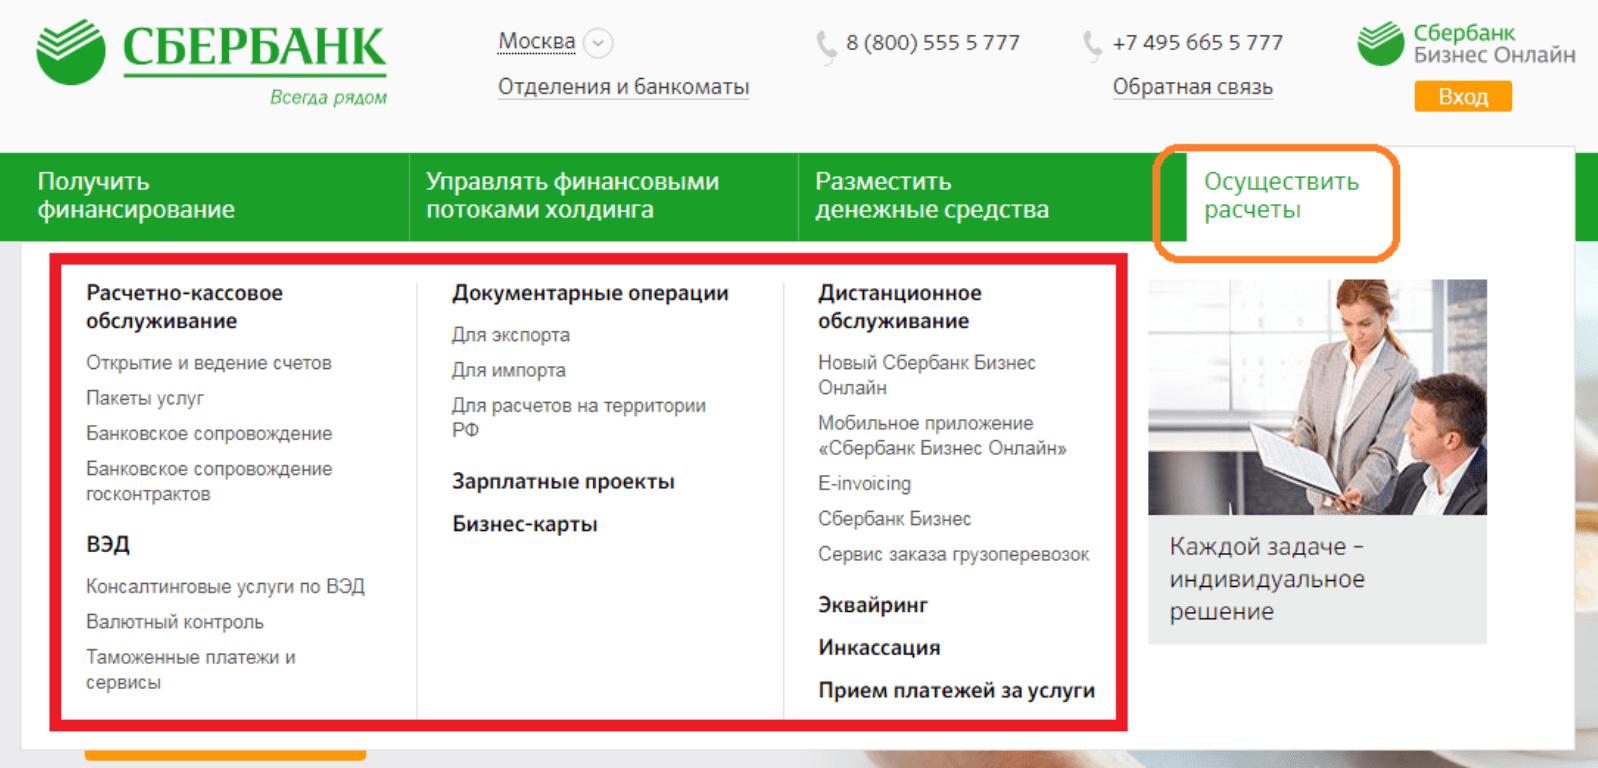 Расчеты в Сбербанк Бизнес онлайн